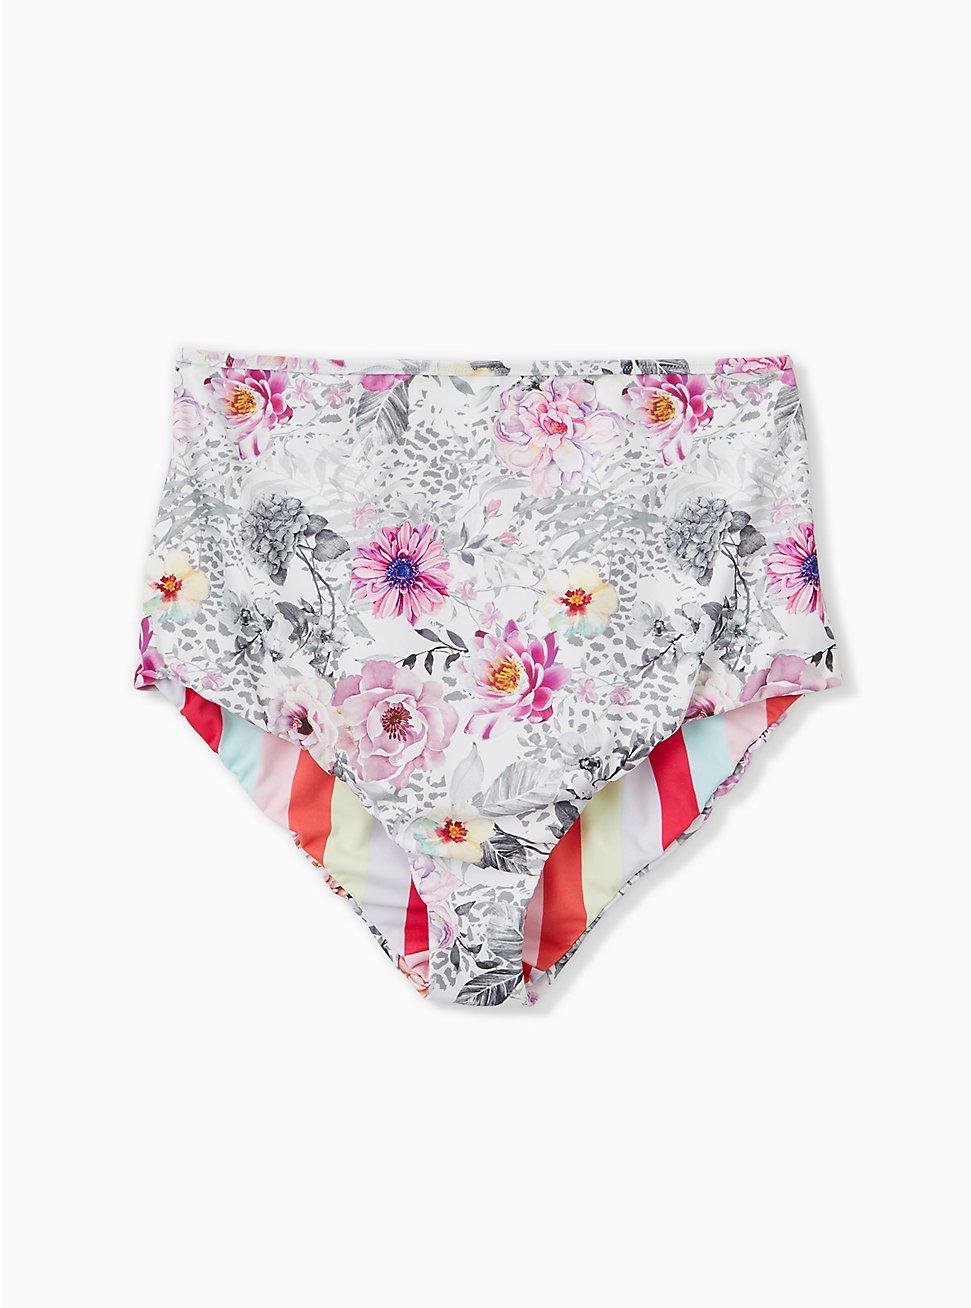 Coral Stripe & White Floral Reversible High Waist Swim Bottom, MULTI, hi-res